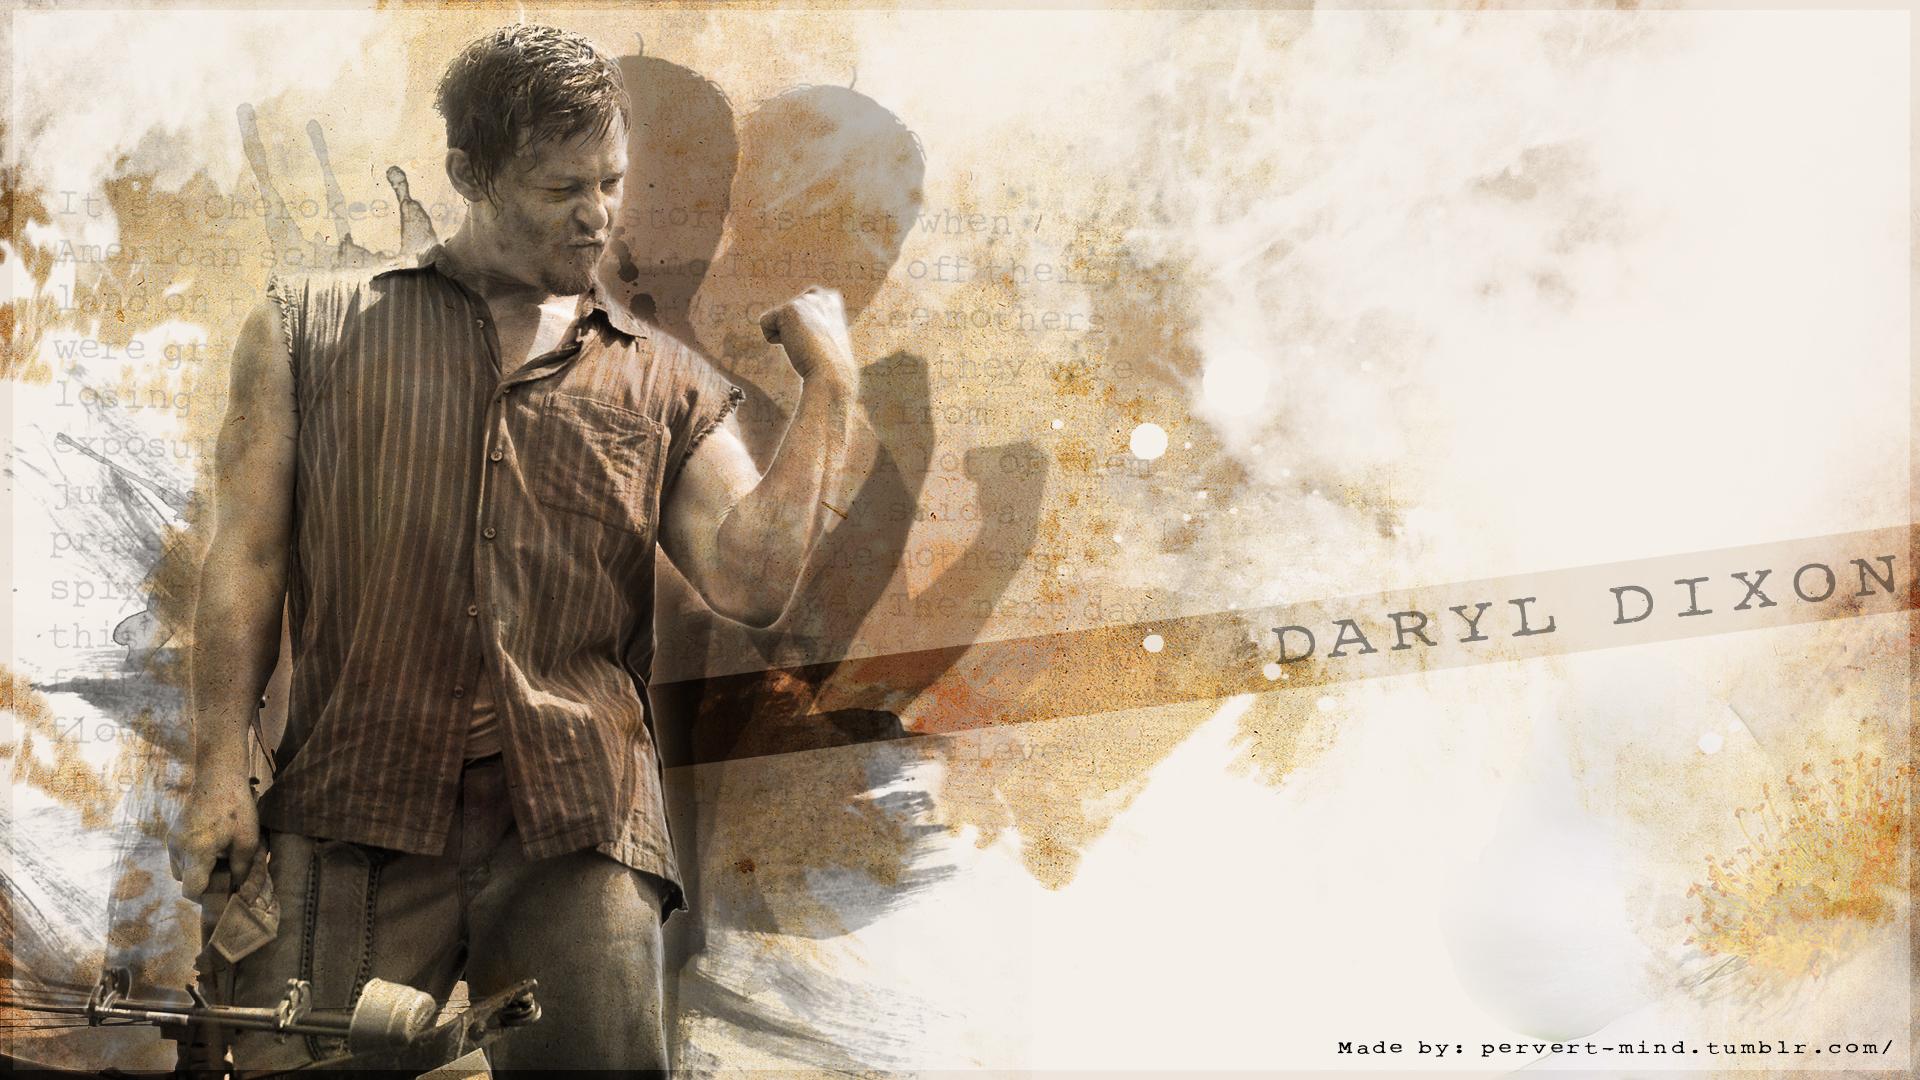 Daryl Dixon Wallpaper 34015181 1920x1080